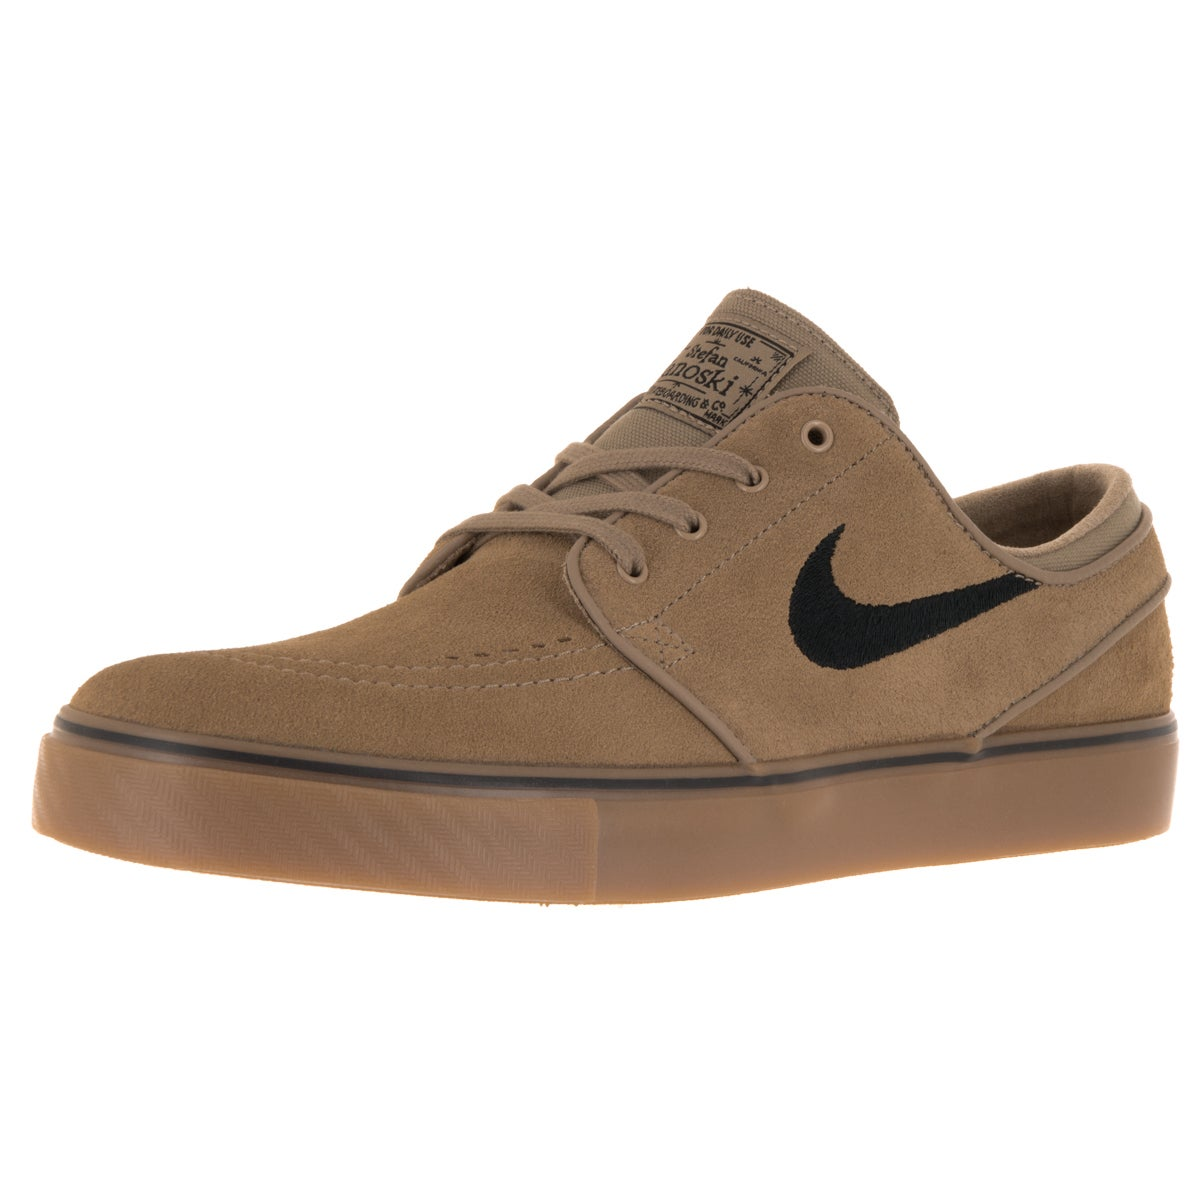 71a99e244dce Shop Nike Men s Zoom Stefan Janoski Khaki Black Gum Light Brown Skate Shoe  - Ships To Canada - Overstock - 12328610